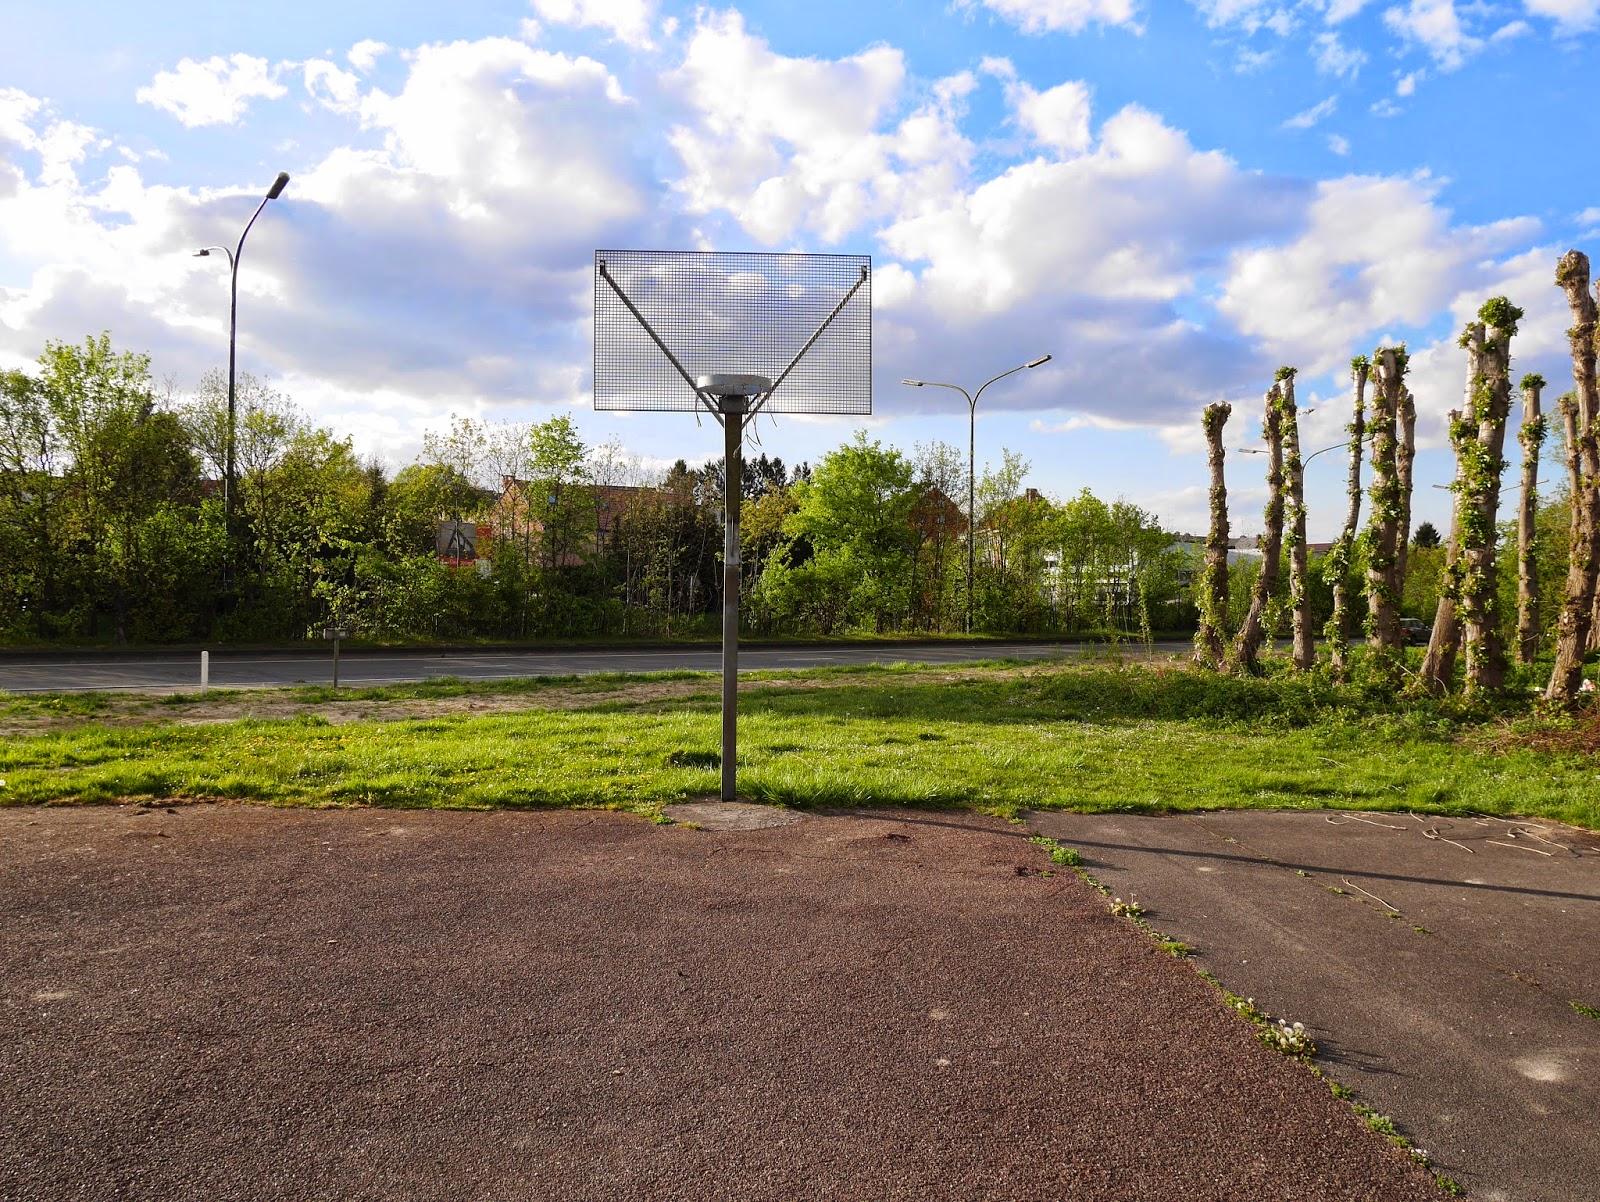 Crossket-ball